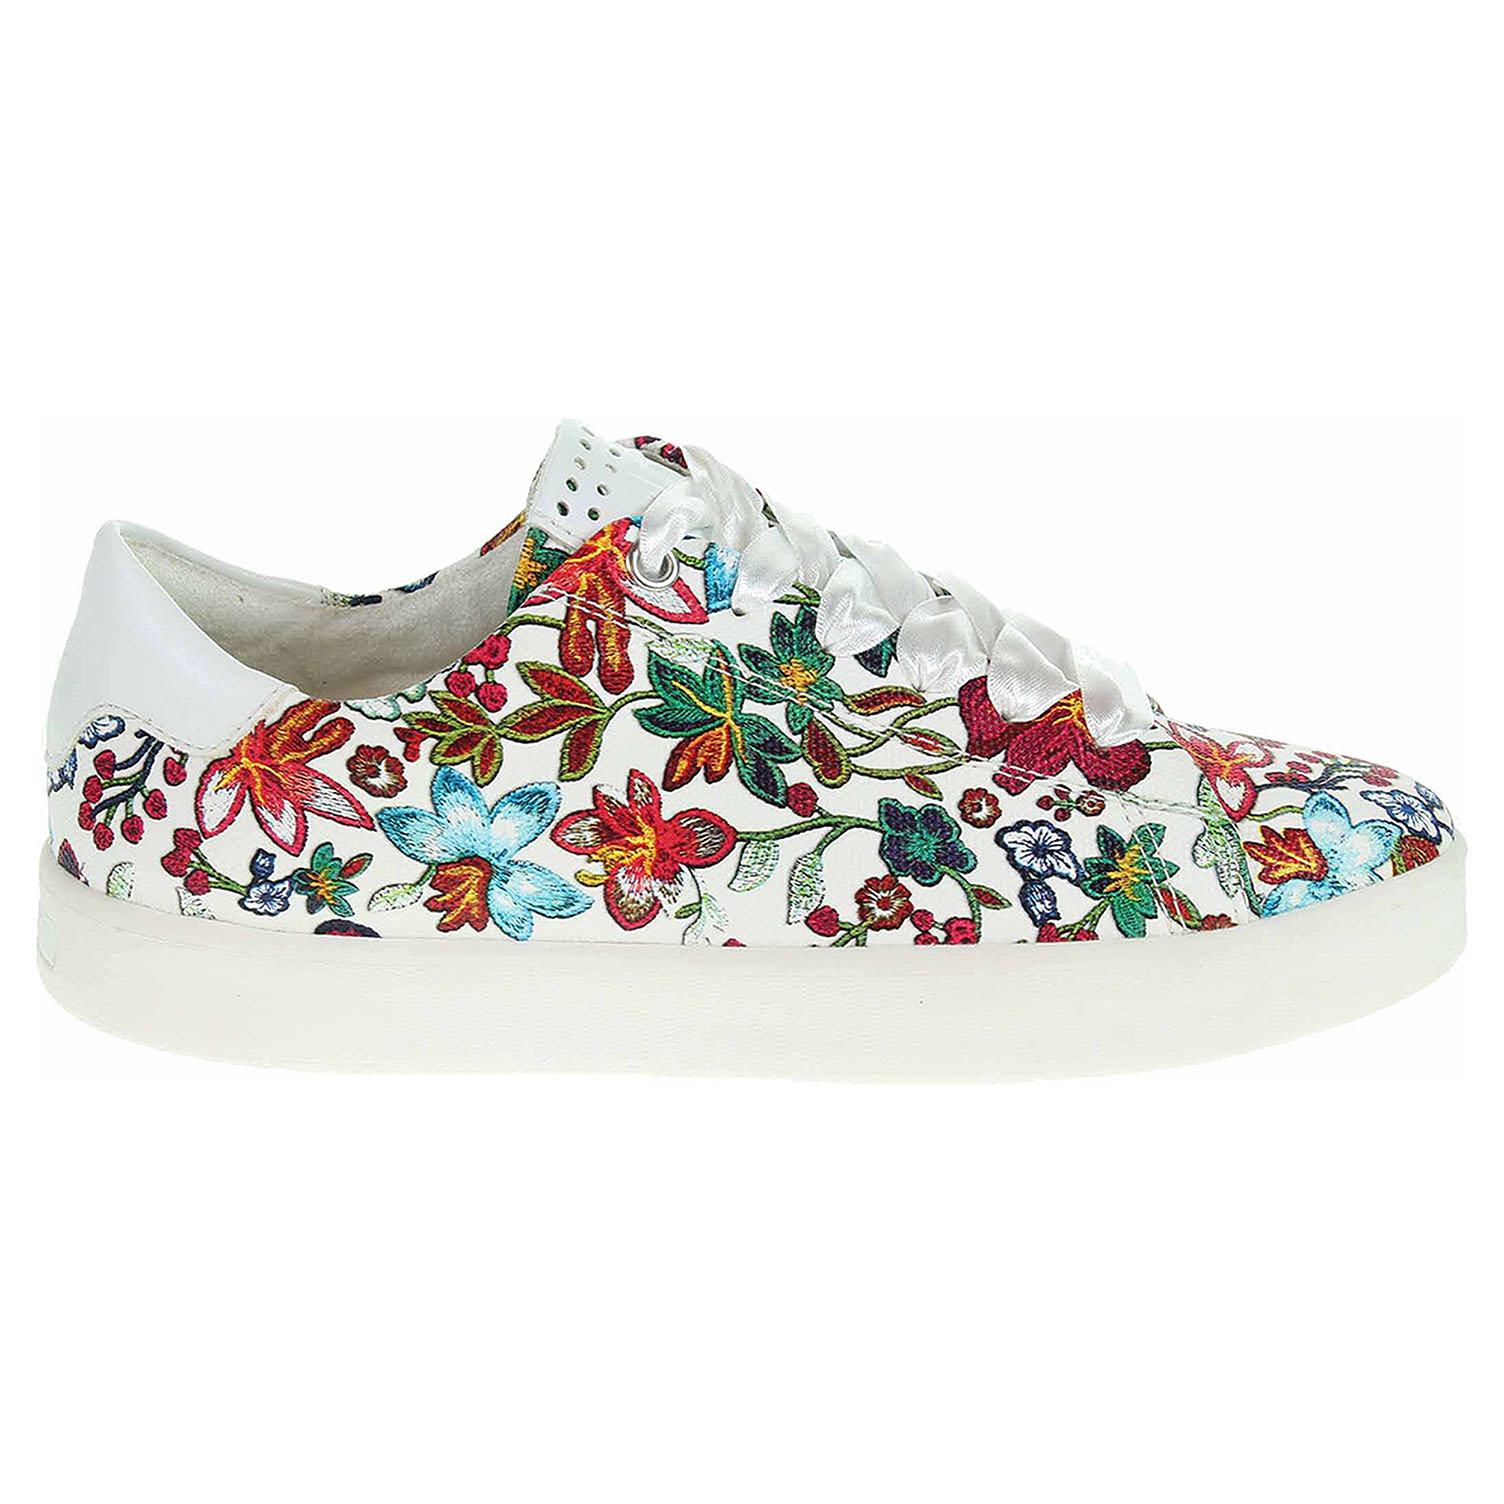 Marco Tozzi dámská obuv 2-23777-30 white comb 2-2-23777-30 197 36